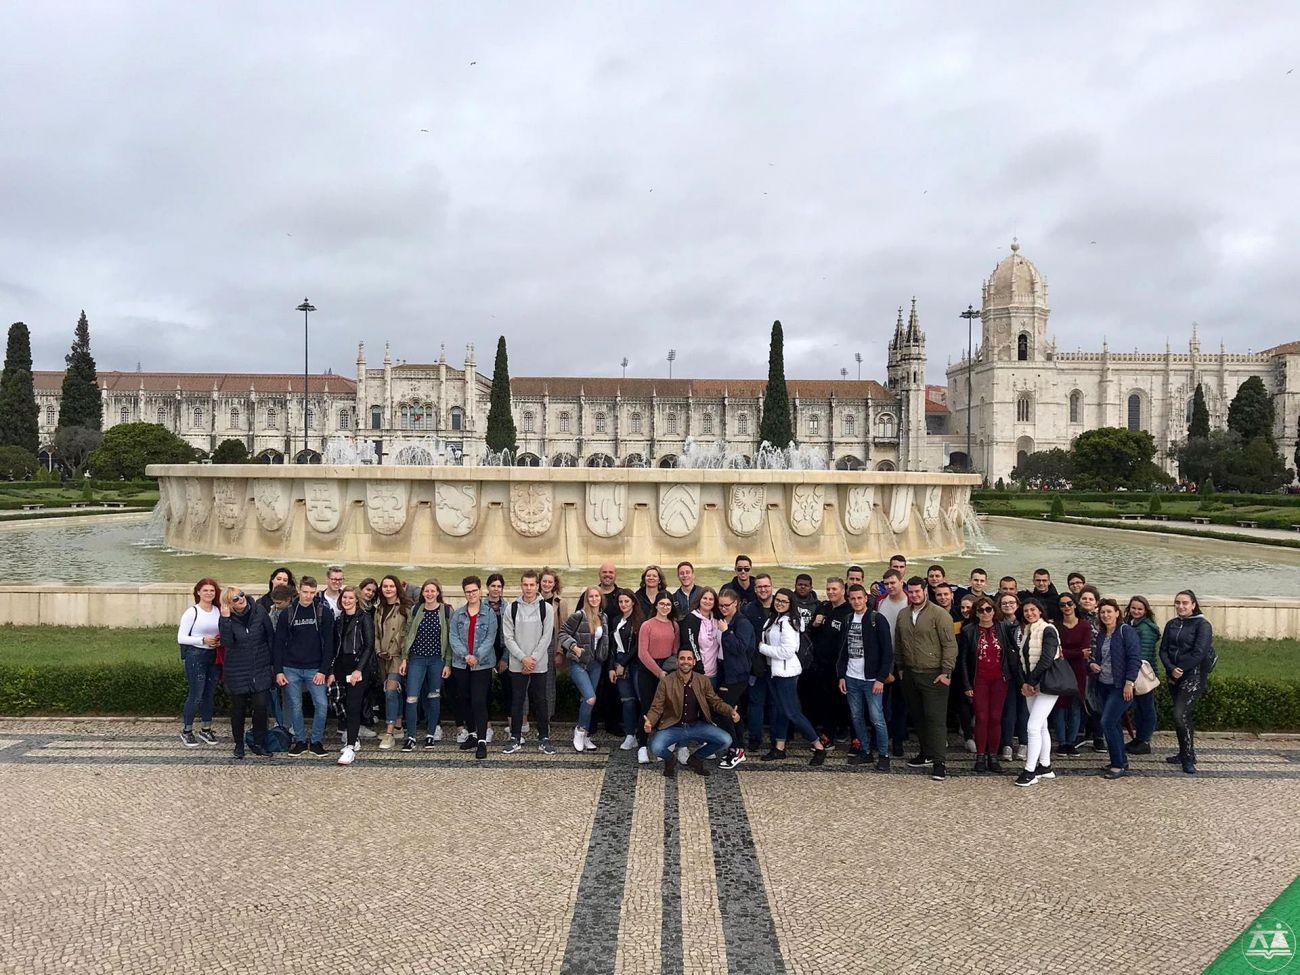 Erasmus-Braga-2019-Lizbona-Fatima-027